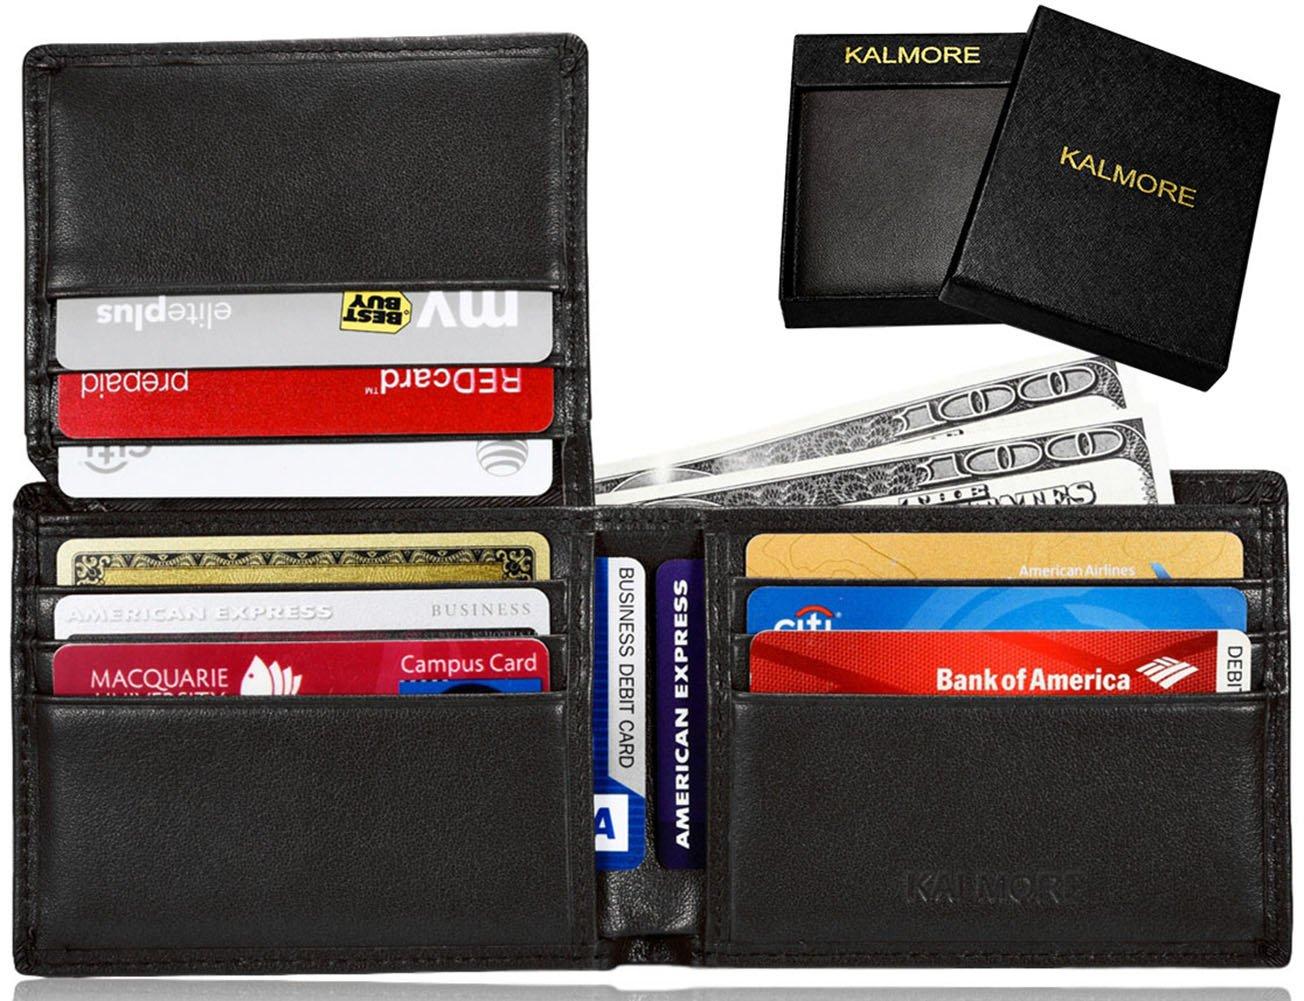 KALMORE Men's RFID Blocking Flip-ID Window Travel Bifold Genuine Leather Wallet - in Gift Box (Full-Grain Leather Black)